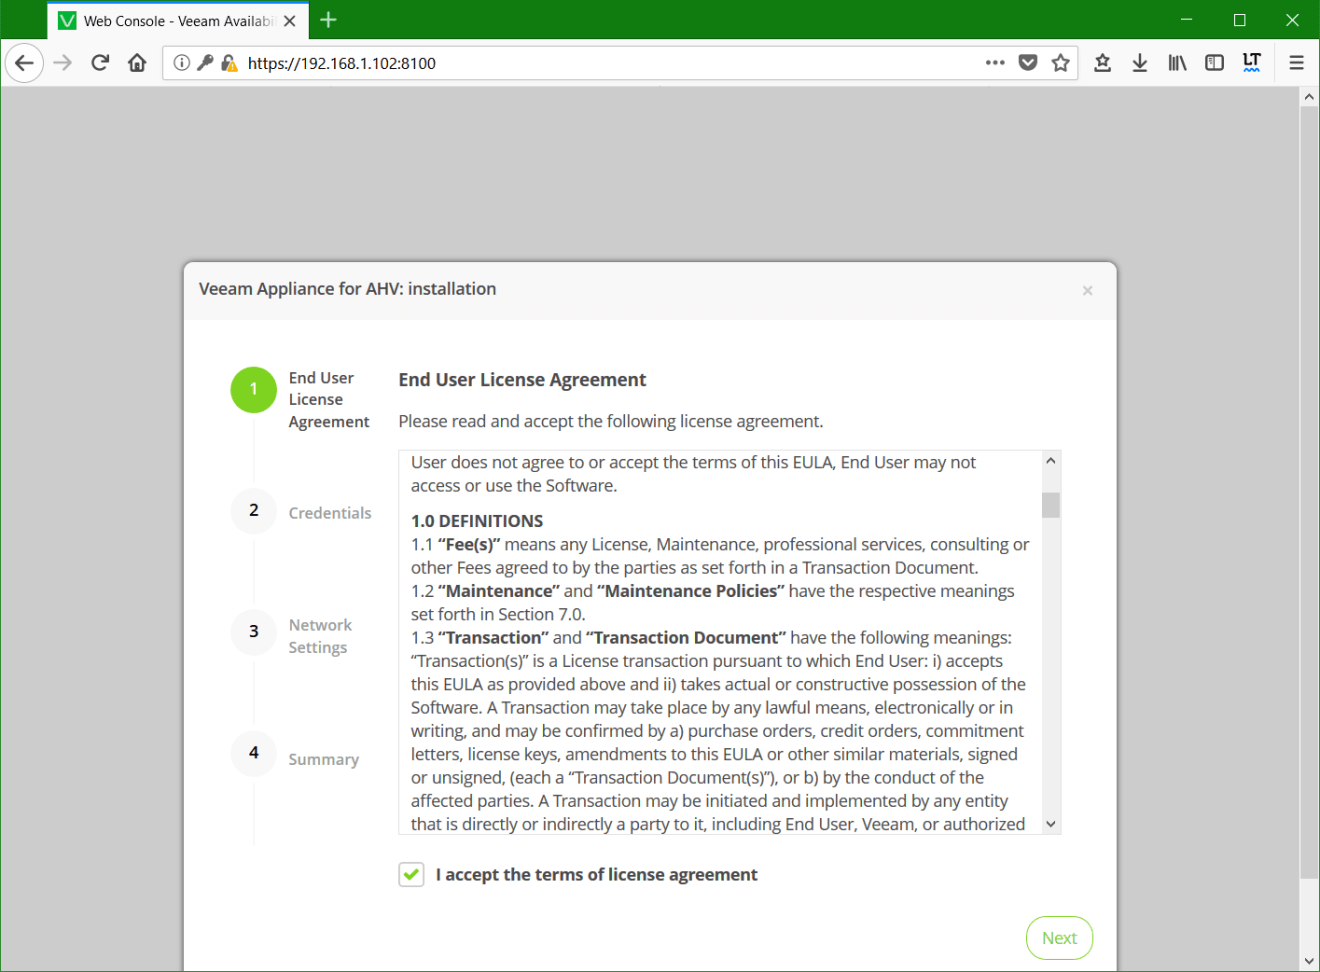 domalab.com Install Veeam VAN license agreement